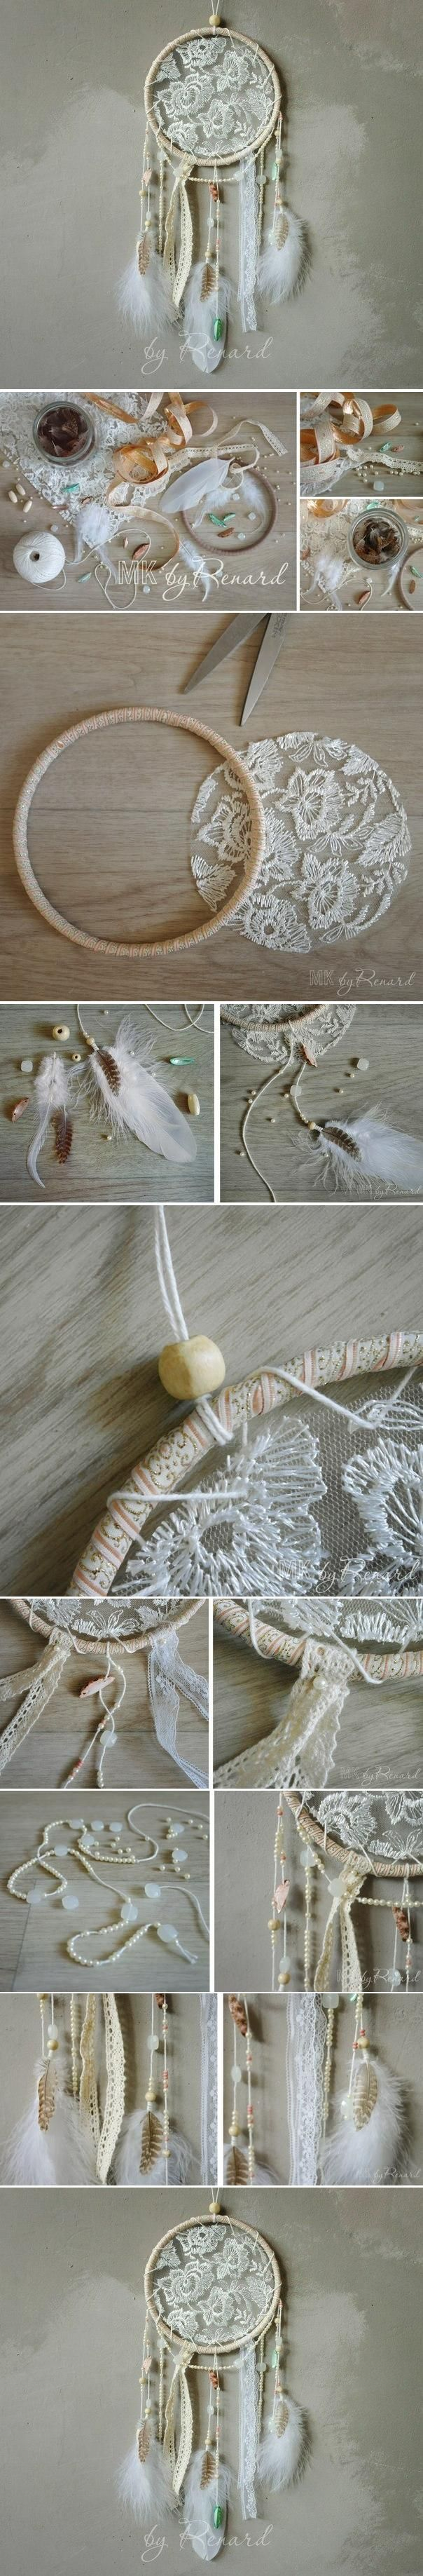 DIY Simple Dreamcatcher-SO cute need to make. xo